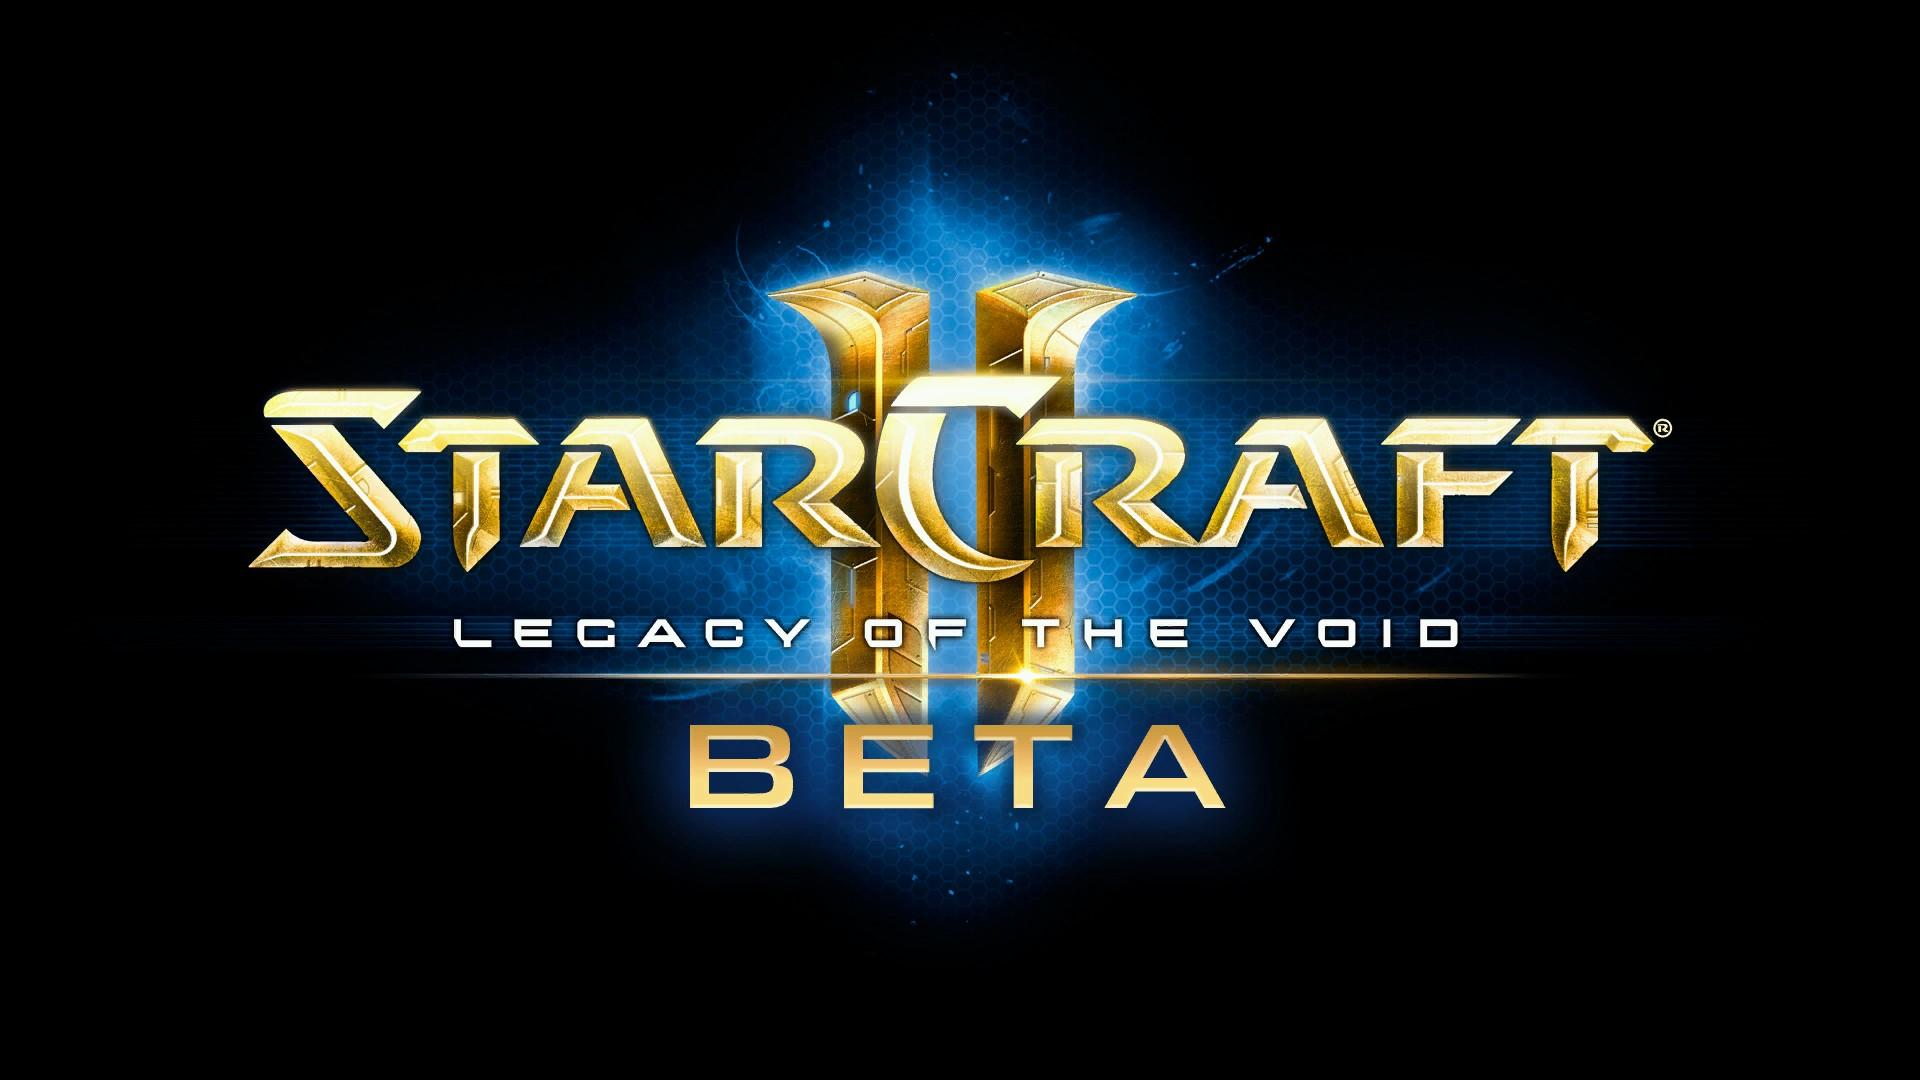 StarCraft II: бета Legacy of the Void доступна для скачивания